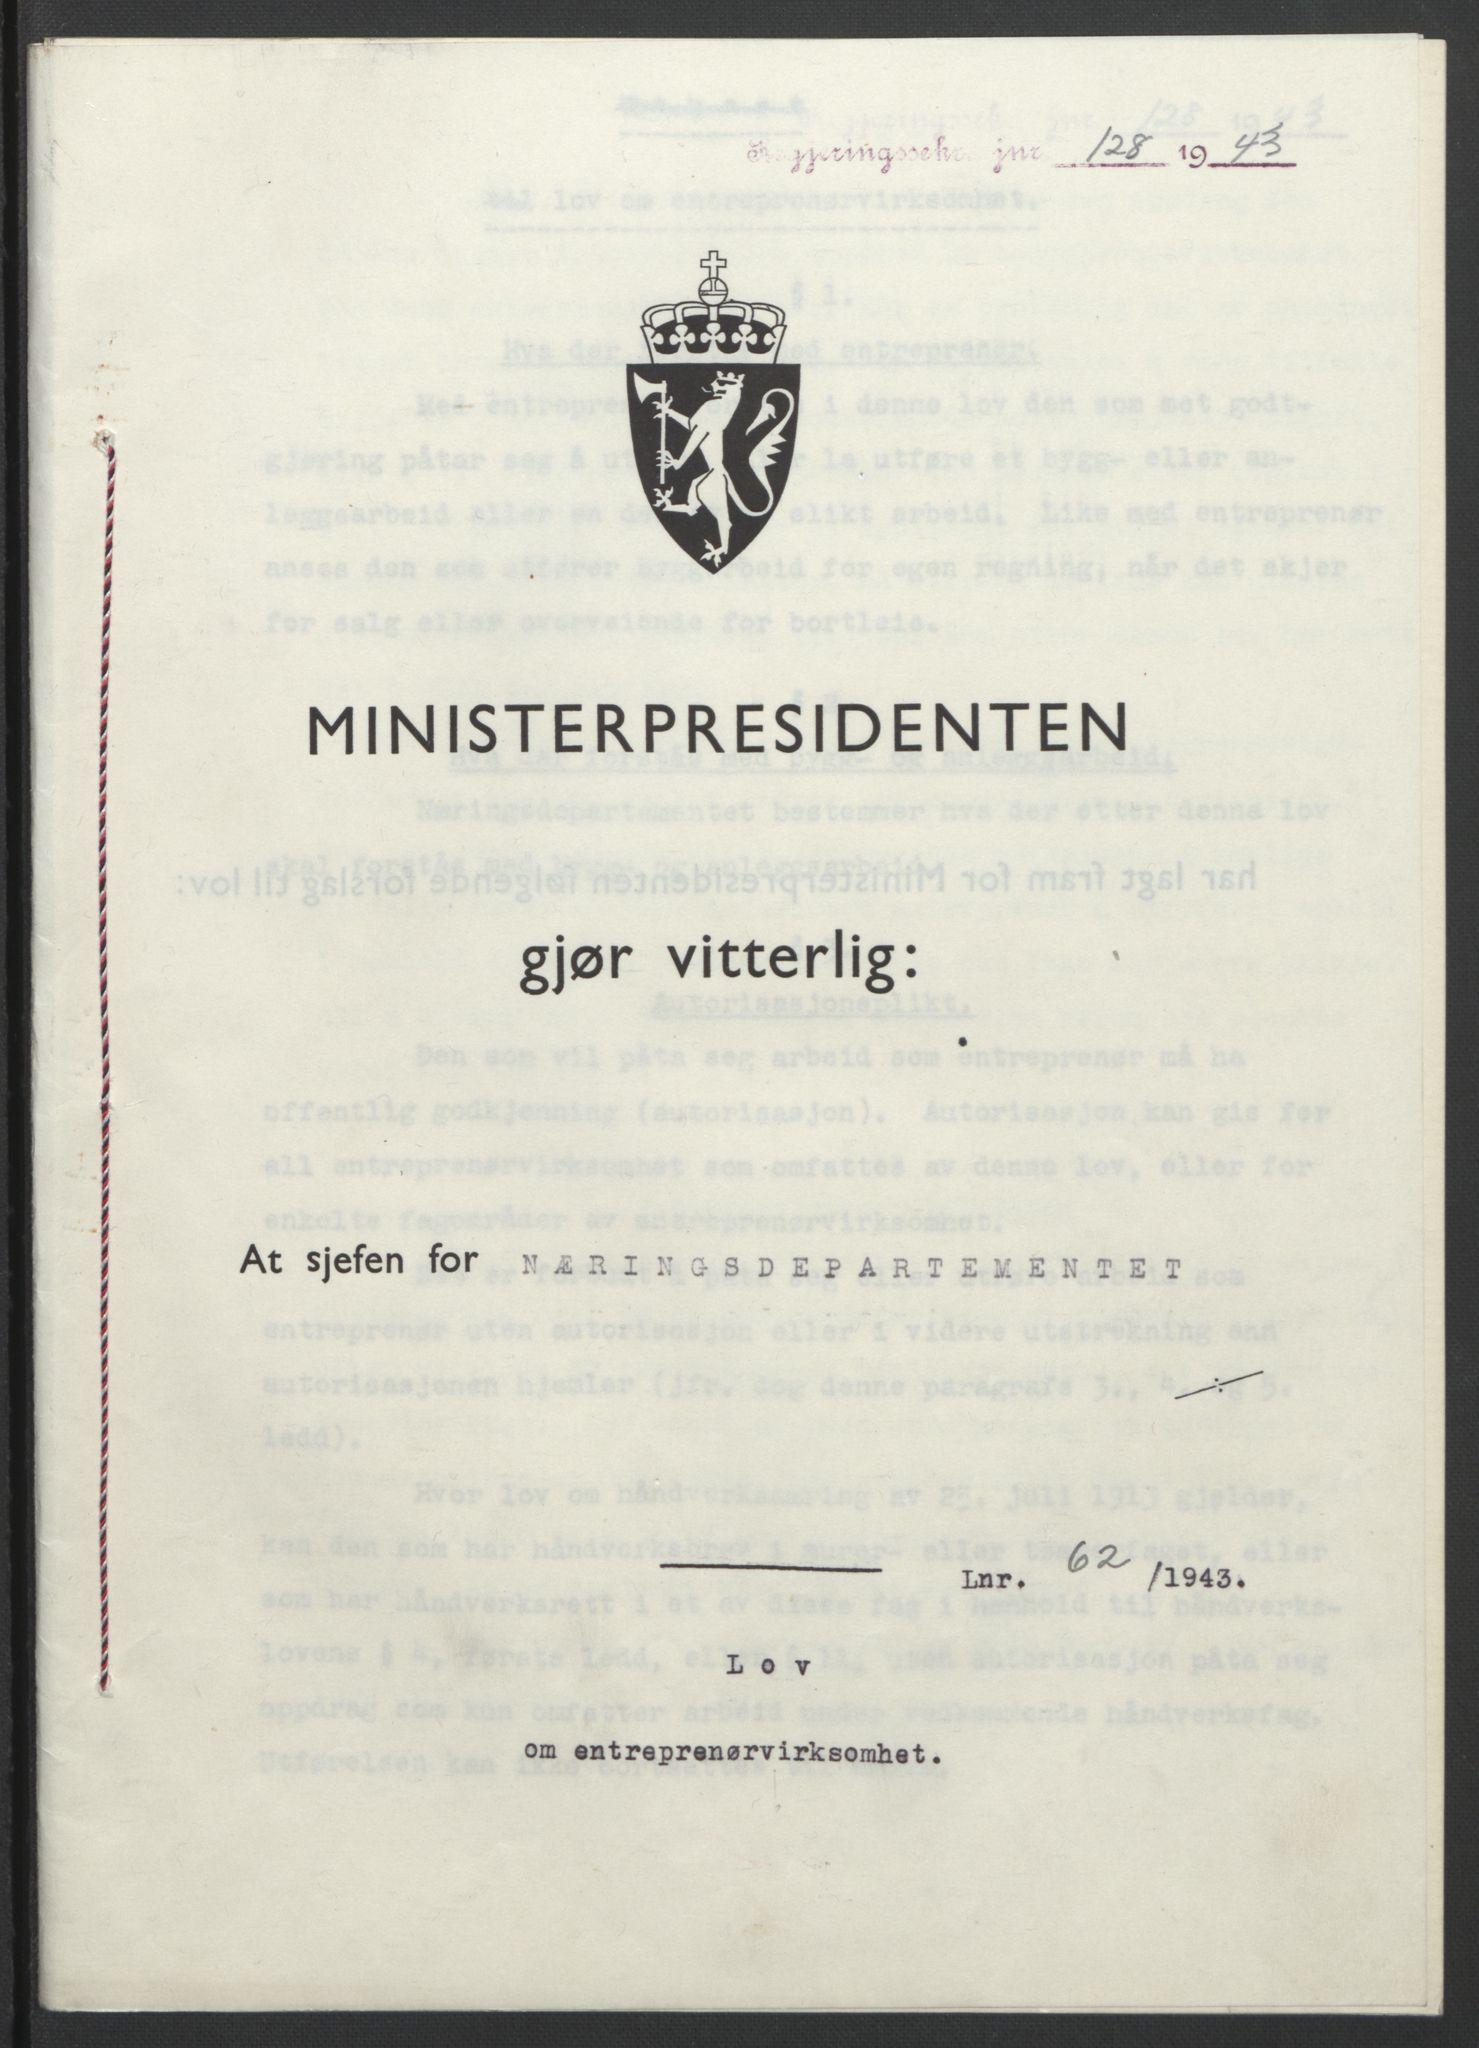 RA, NS-administrasjonen 1940-1945 (Statsrådsekretariatet, de kommisariske statsråder mm), D/Db/L0099: Lover, 1943, s. 279